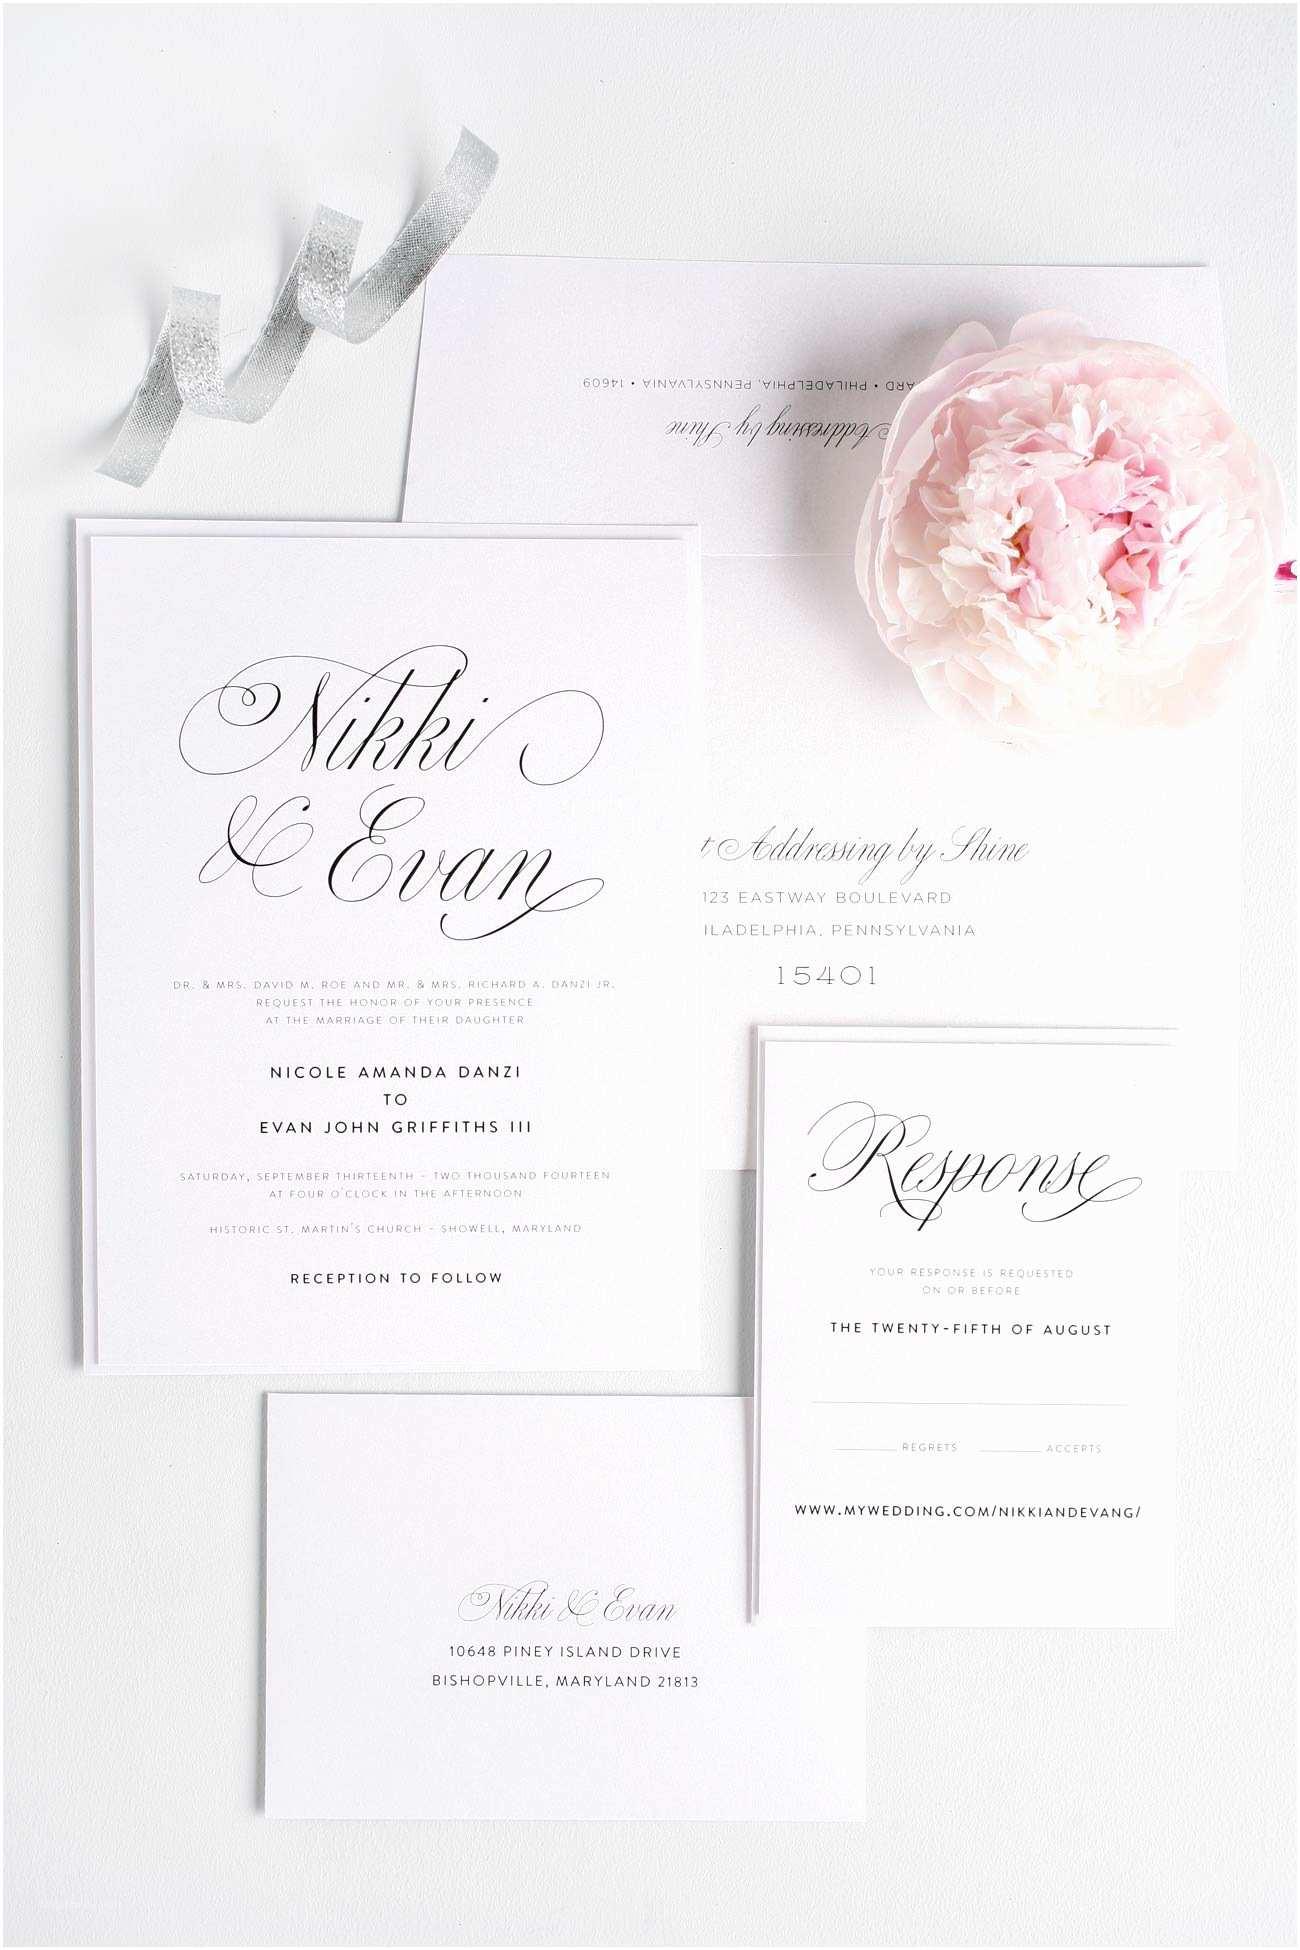 Elegant Wedding Invitations Pink Script Wedding Invitations – Wedding Invitations